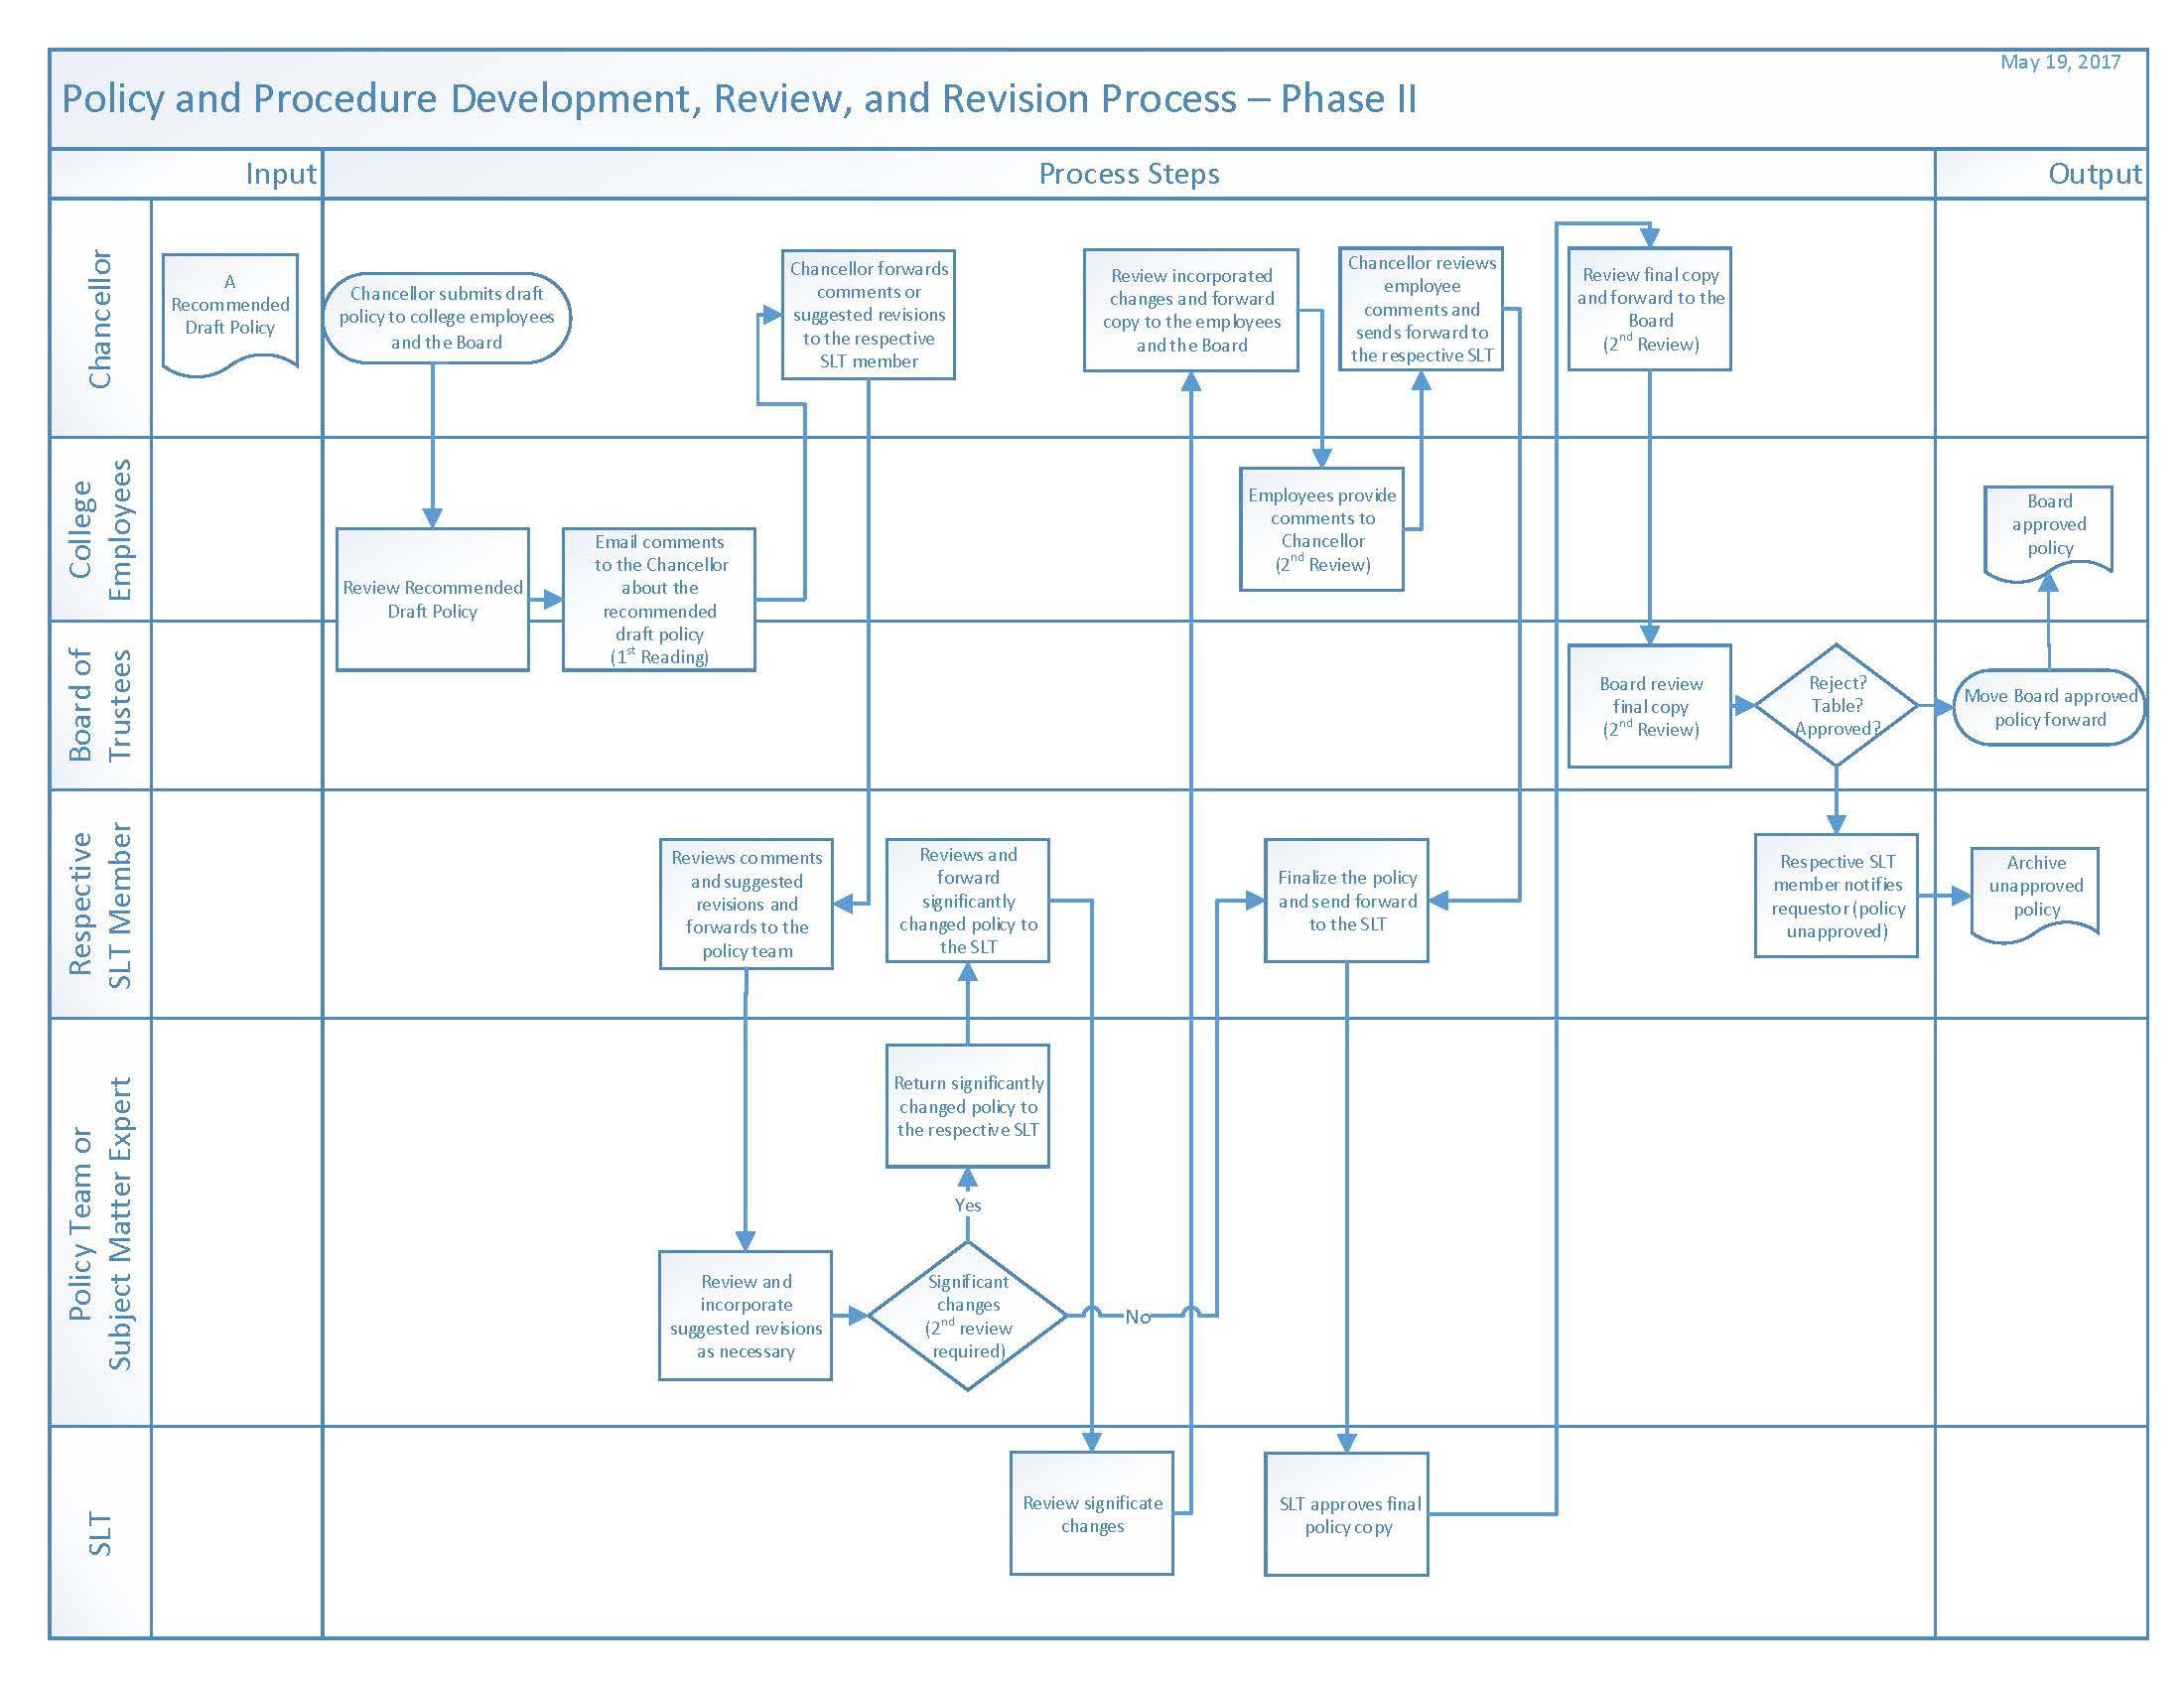 Policies & Procedures Phase 2